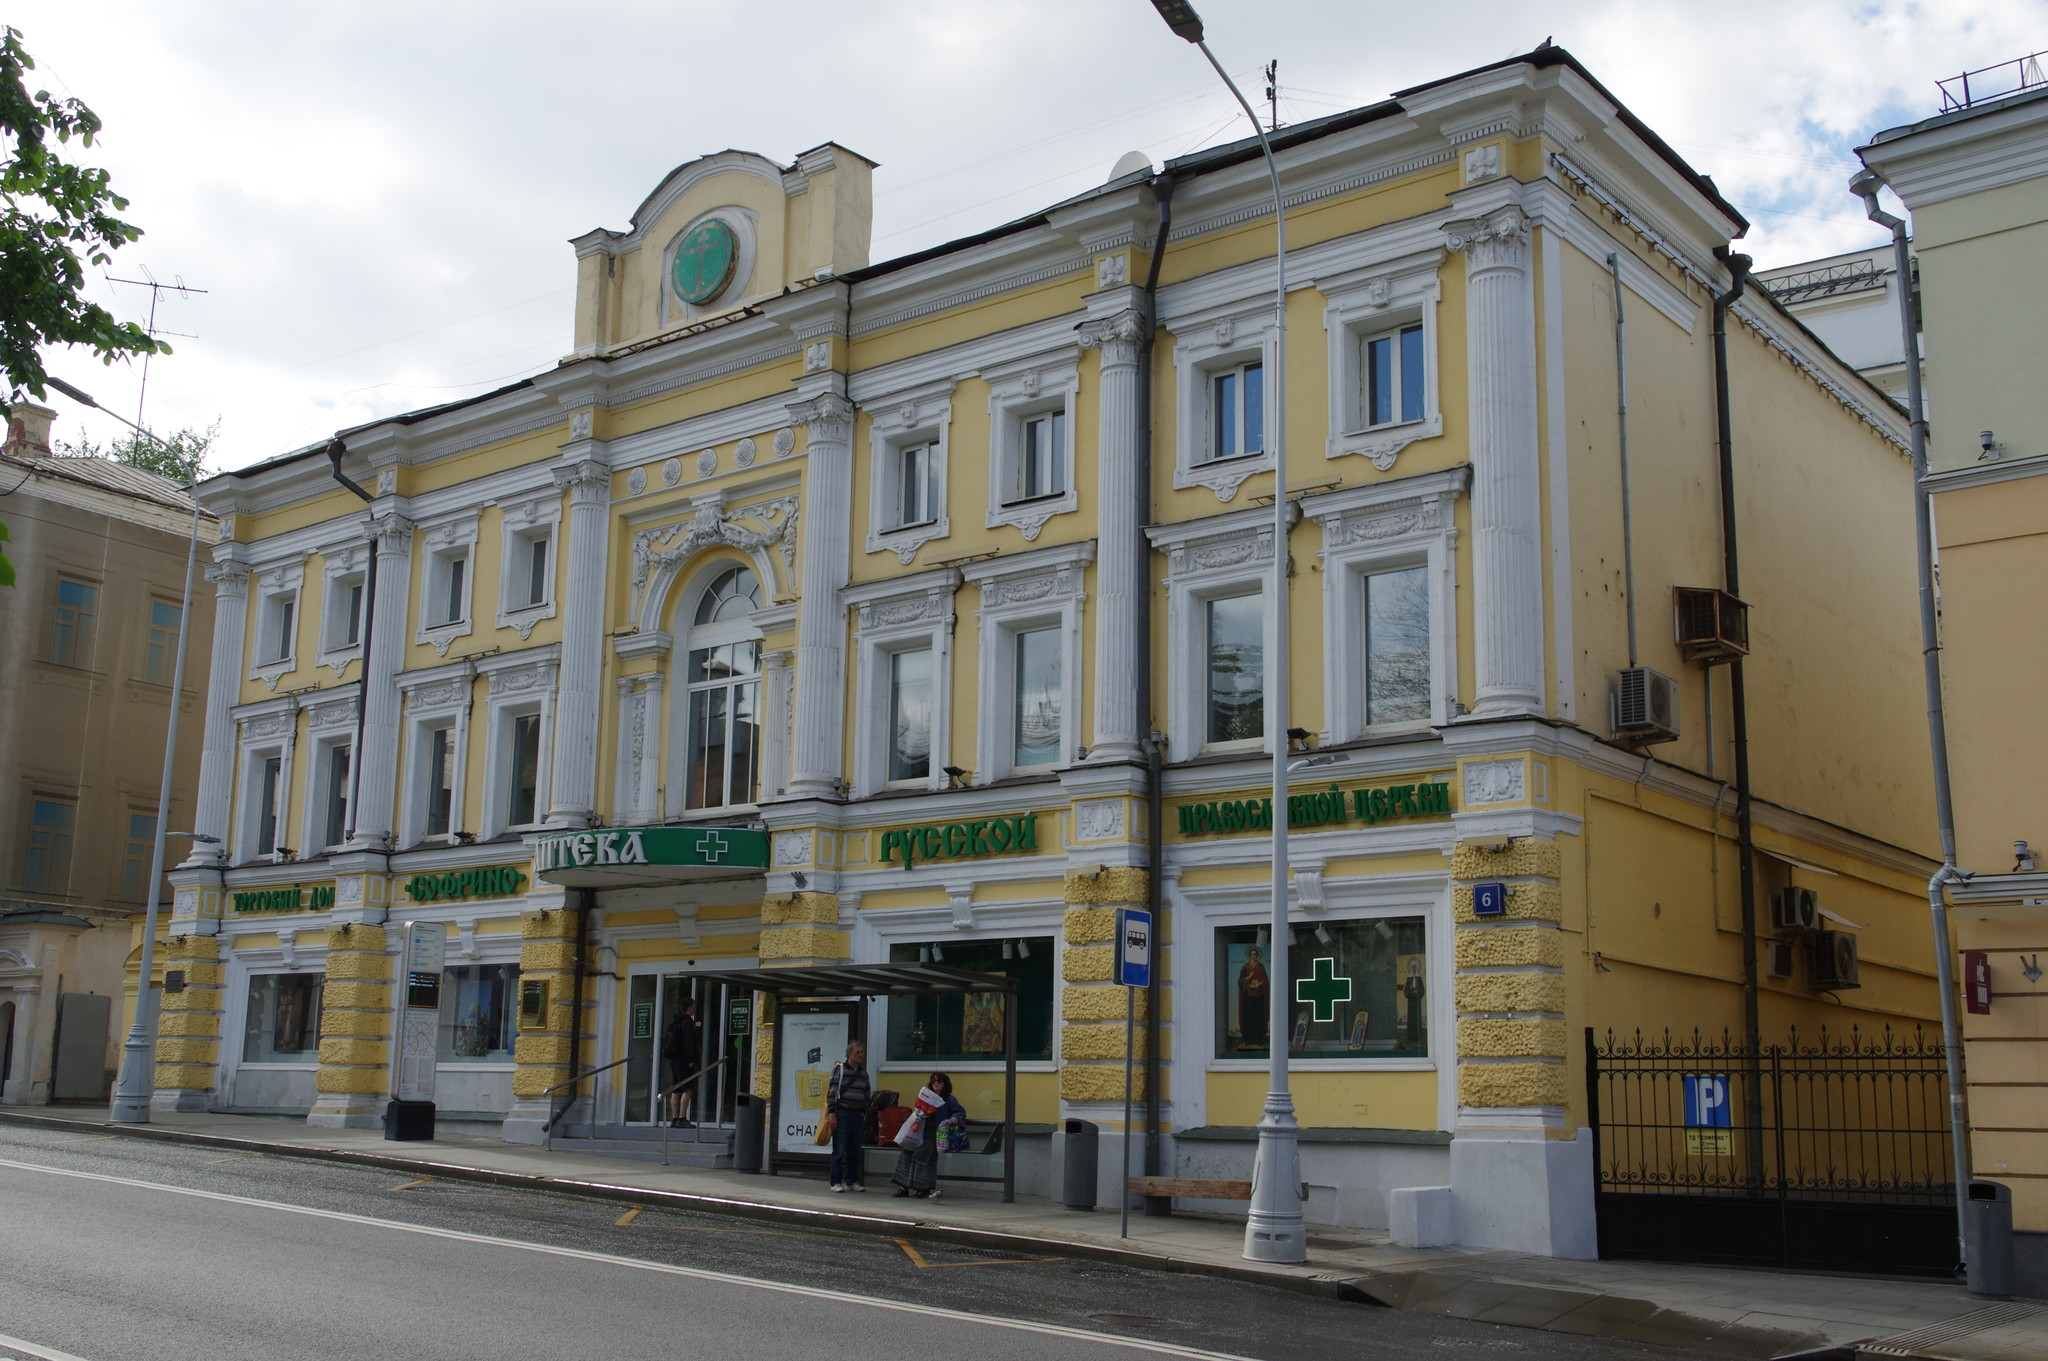 Аптека Андрея Форбрихера («Пречистенская Аптека»). Улица Пречистенка, дом 6